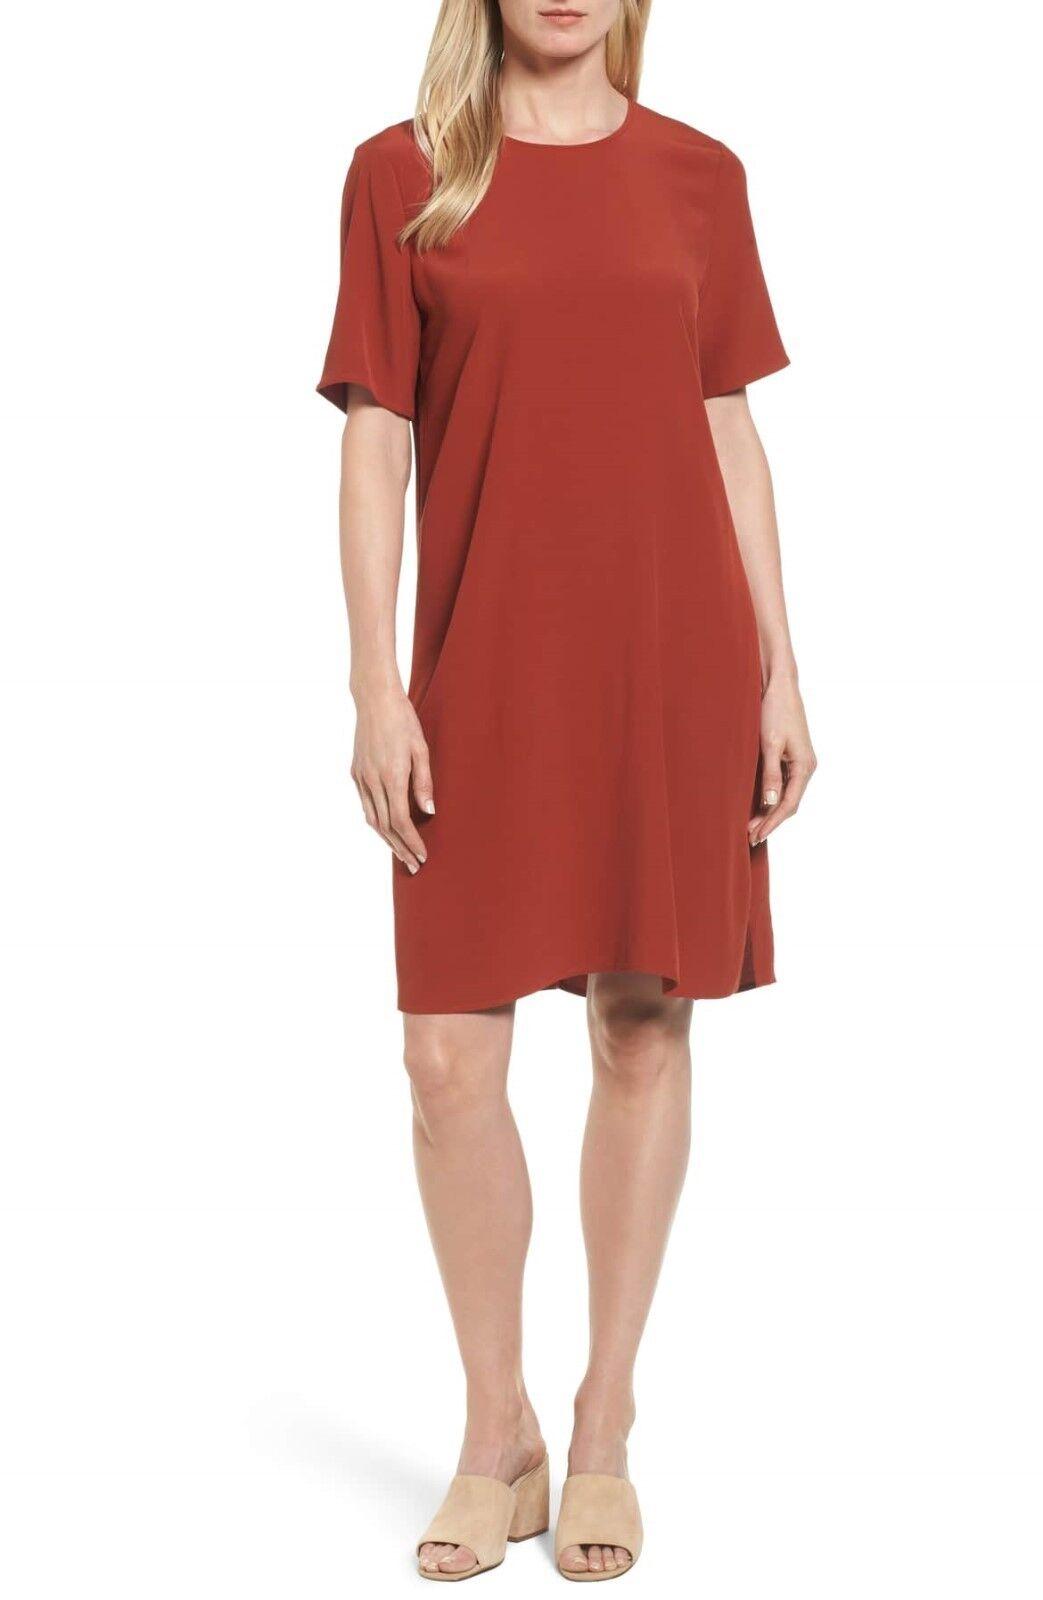 NEW Eileen Fisher Tencel Lyocell Blend Jersey Shift Dress in Autumn - Size XS